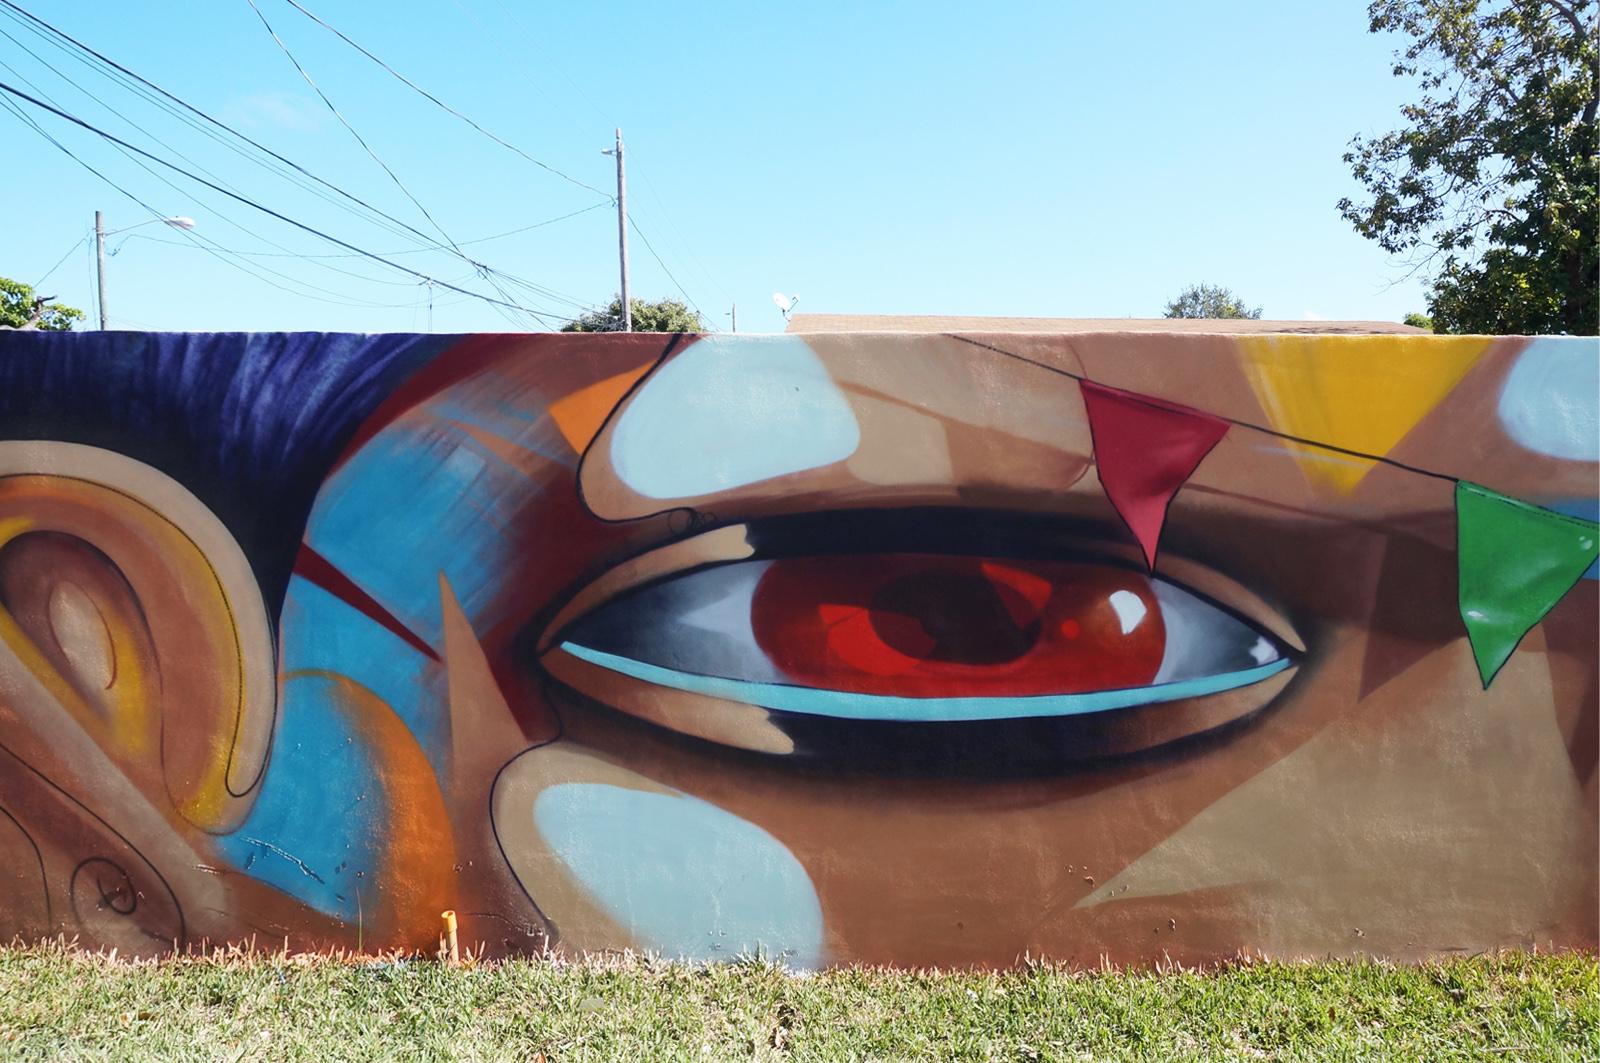 jade-pueblo-presente-new-mural-for-art-basel-2013-02